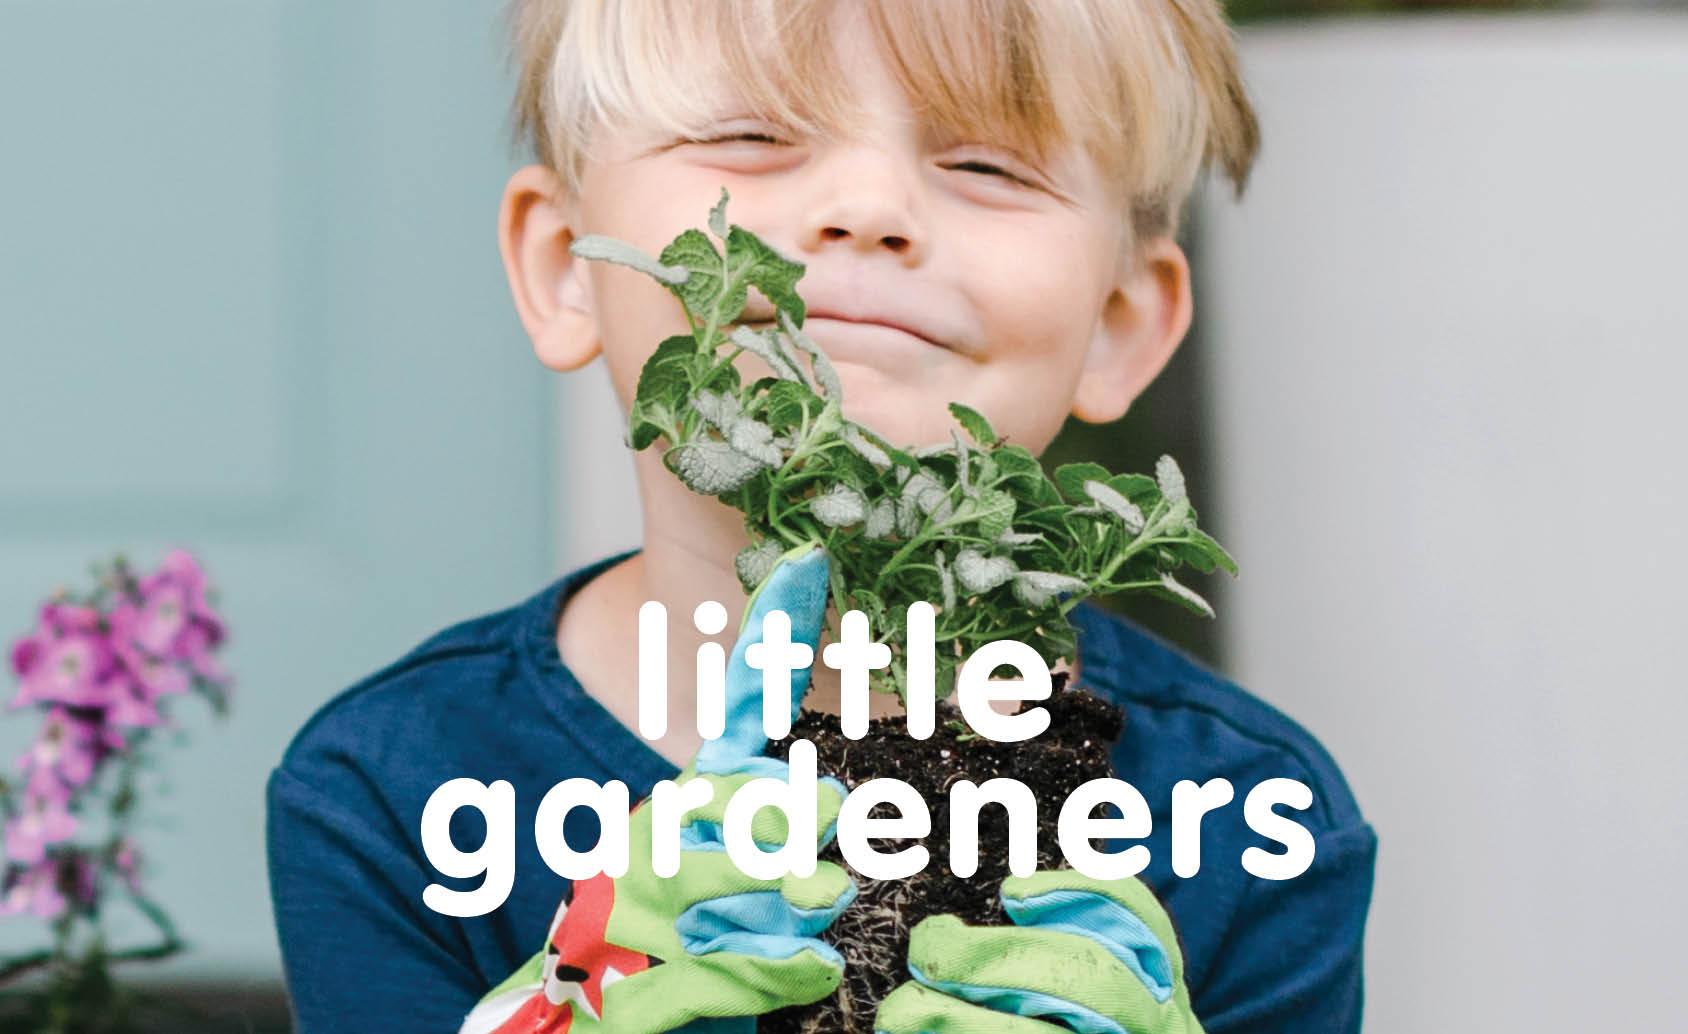 CH5057_Charter Hall_School Holidays_Gardening For Kids_Digital_844x517_FA